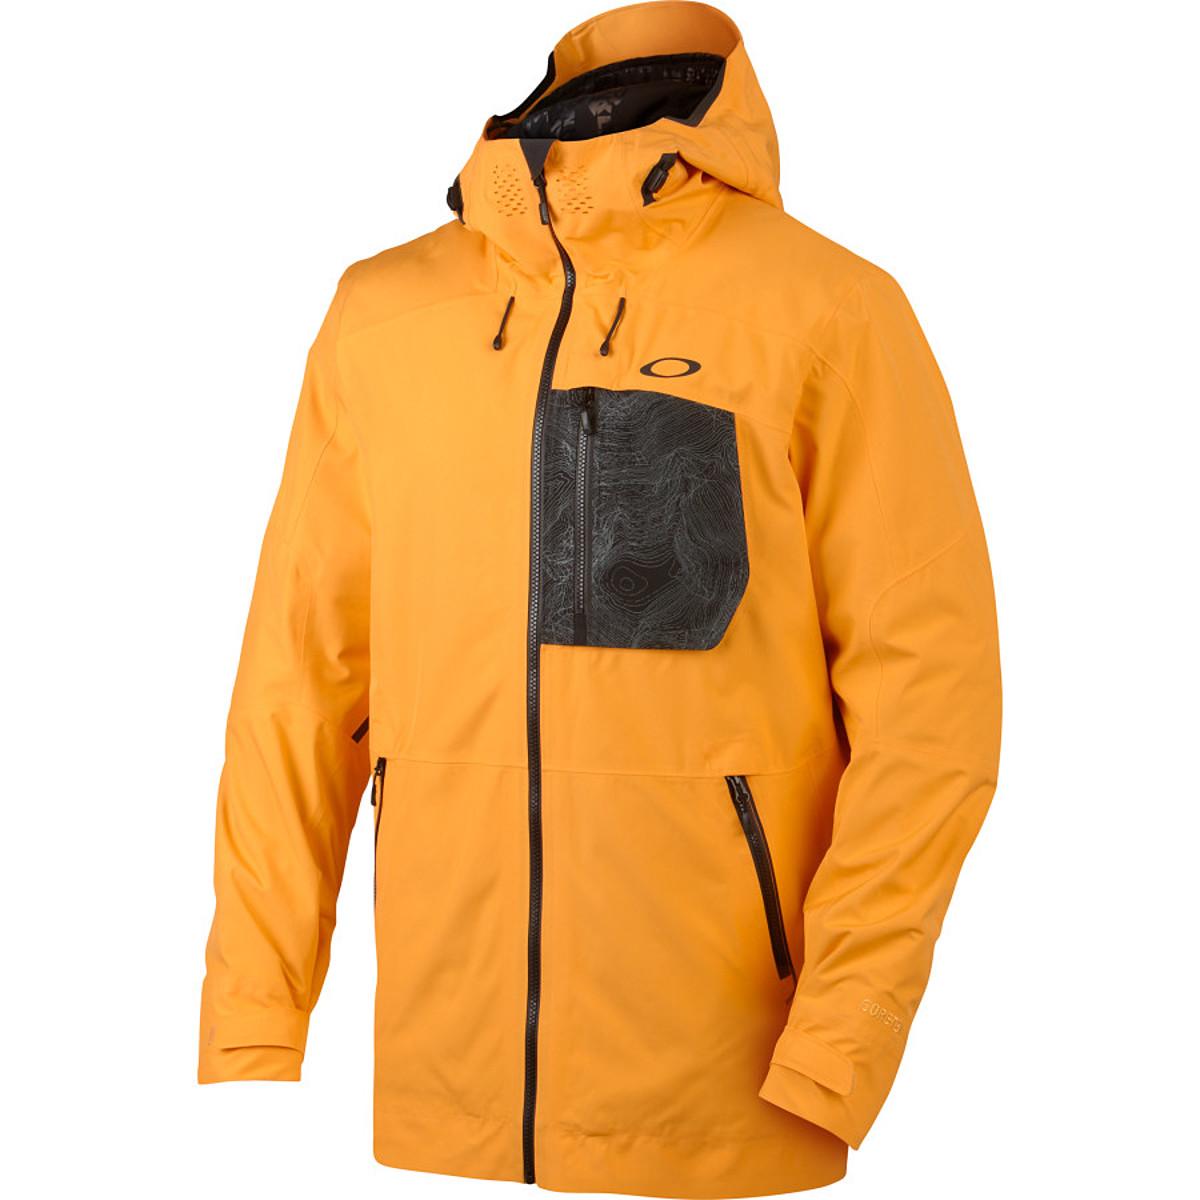 Oakley 453 GORE-TEX Biozone Down Jacket